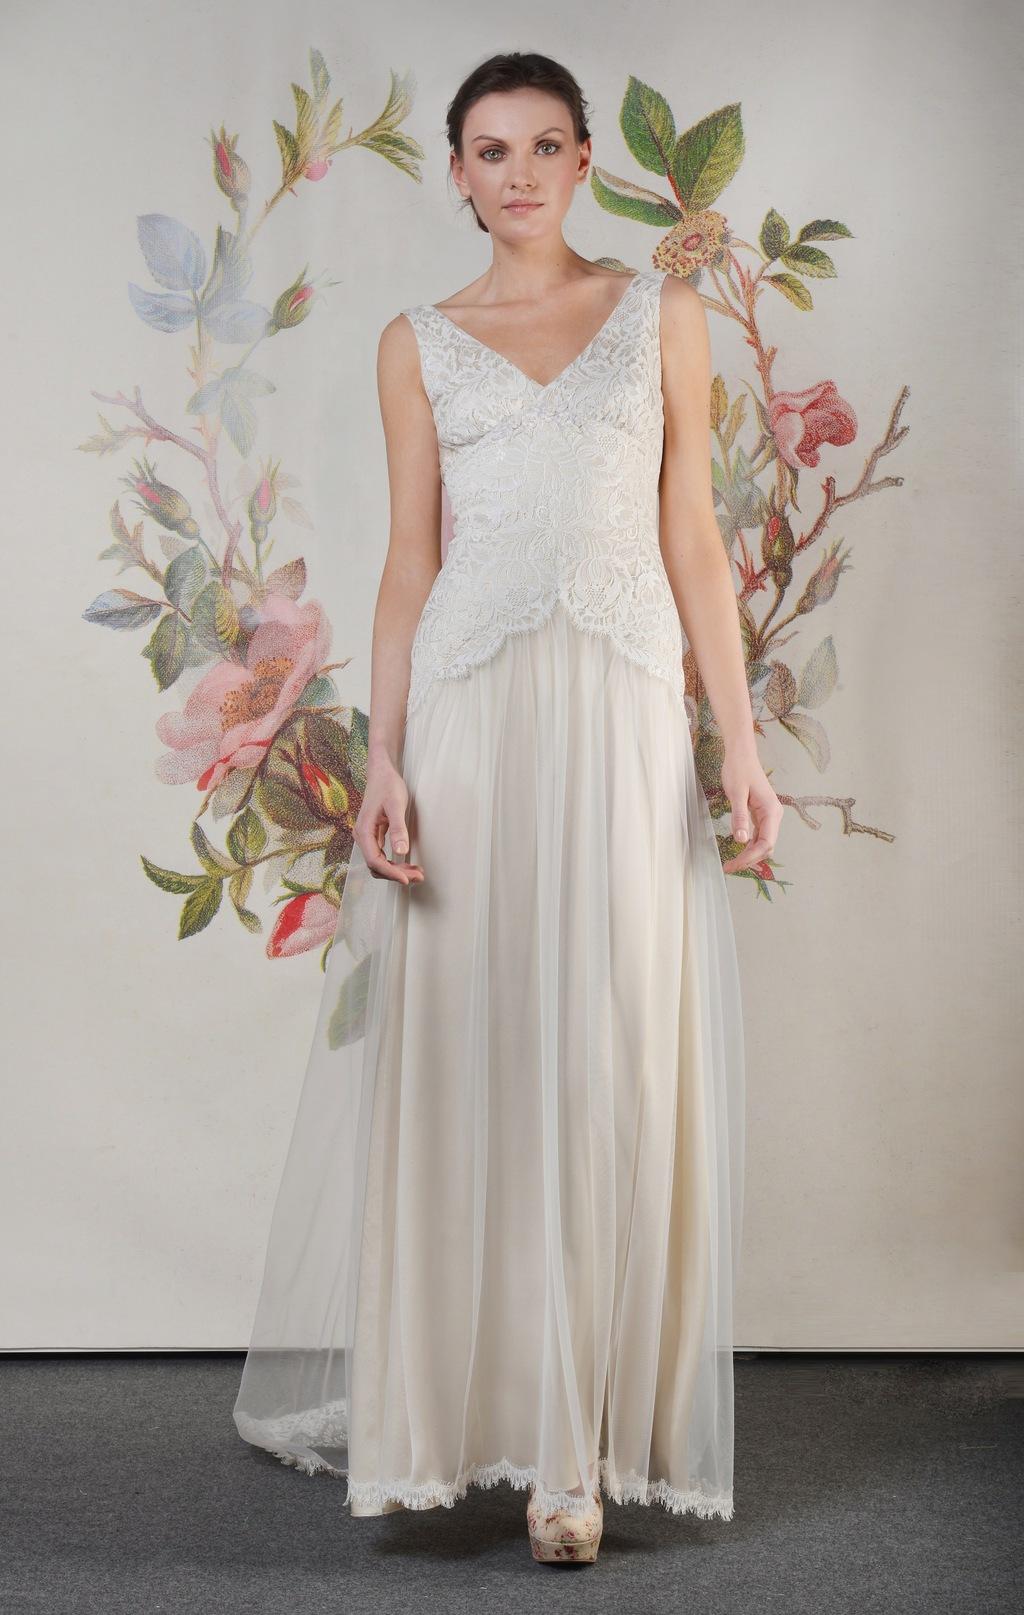 Claire-pettibone-spring-summer-2014-wedding-dress-florentine_f_01.full